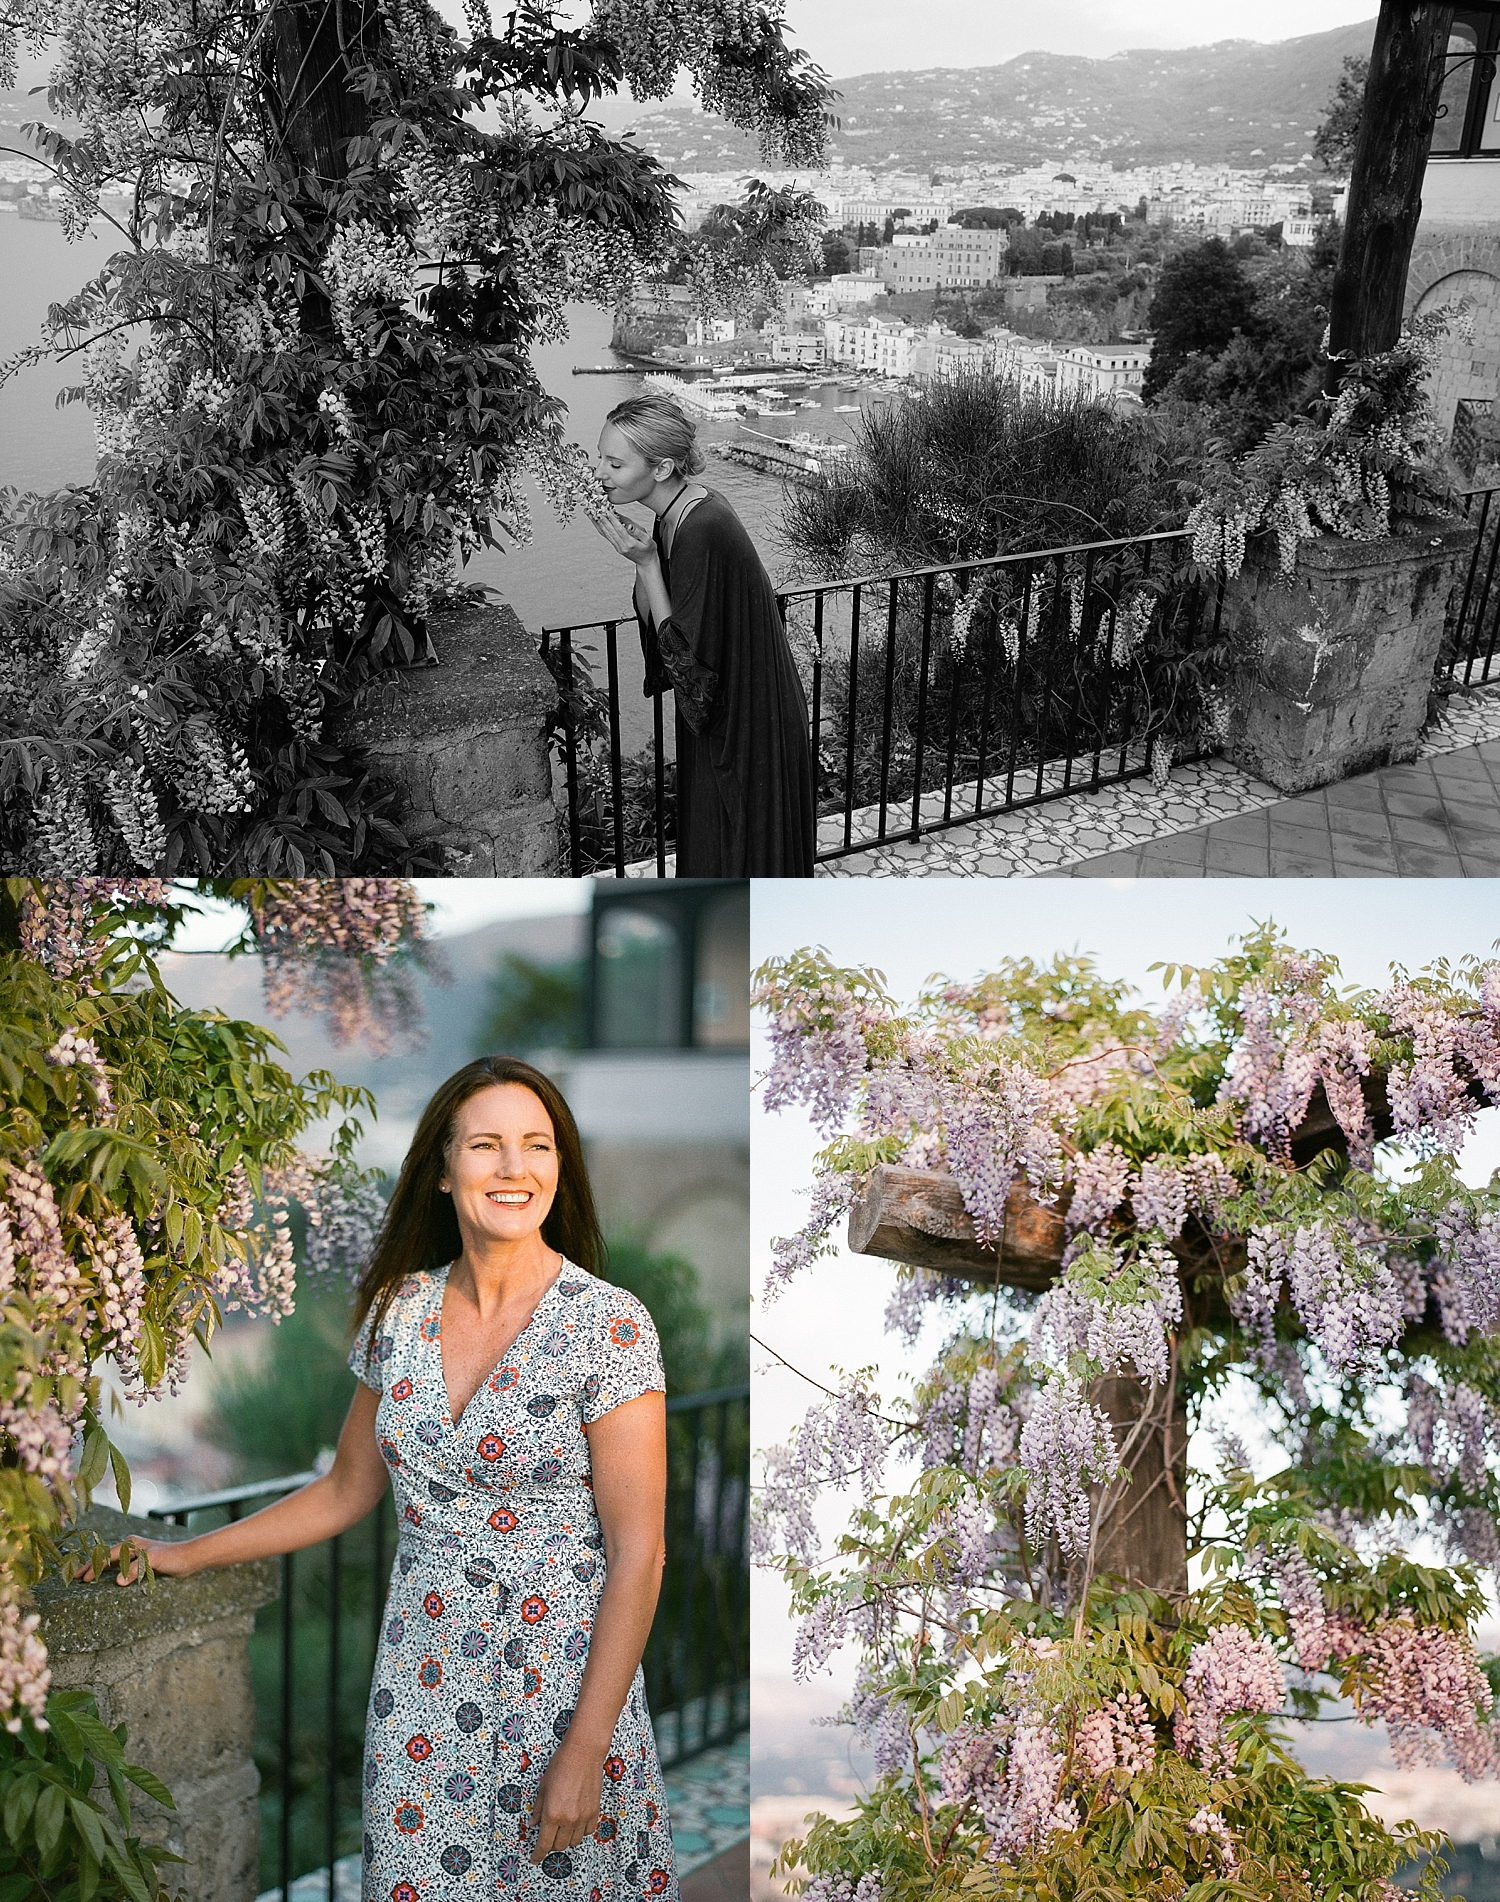 Wisteria in bloom (our terrace, it's huge!)